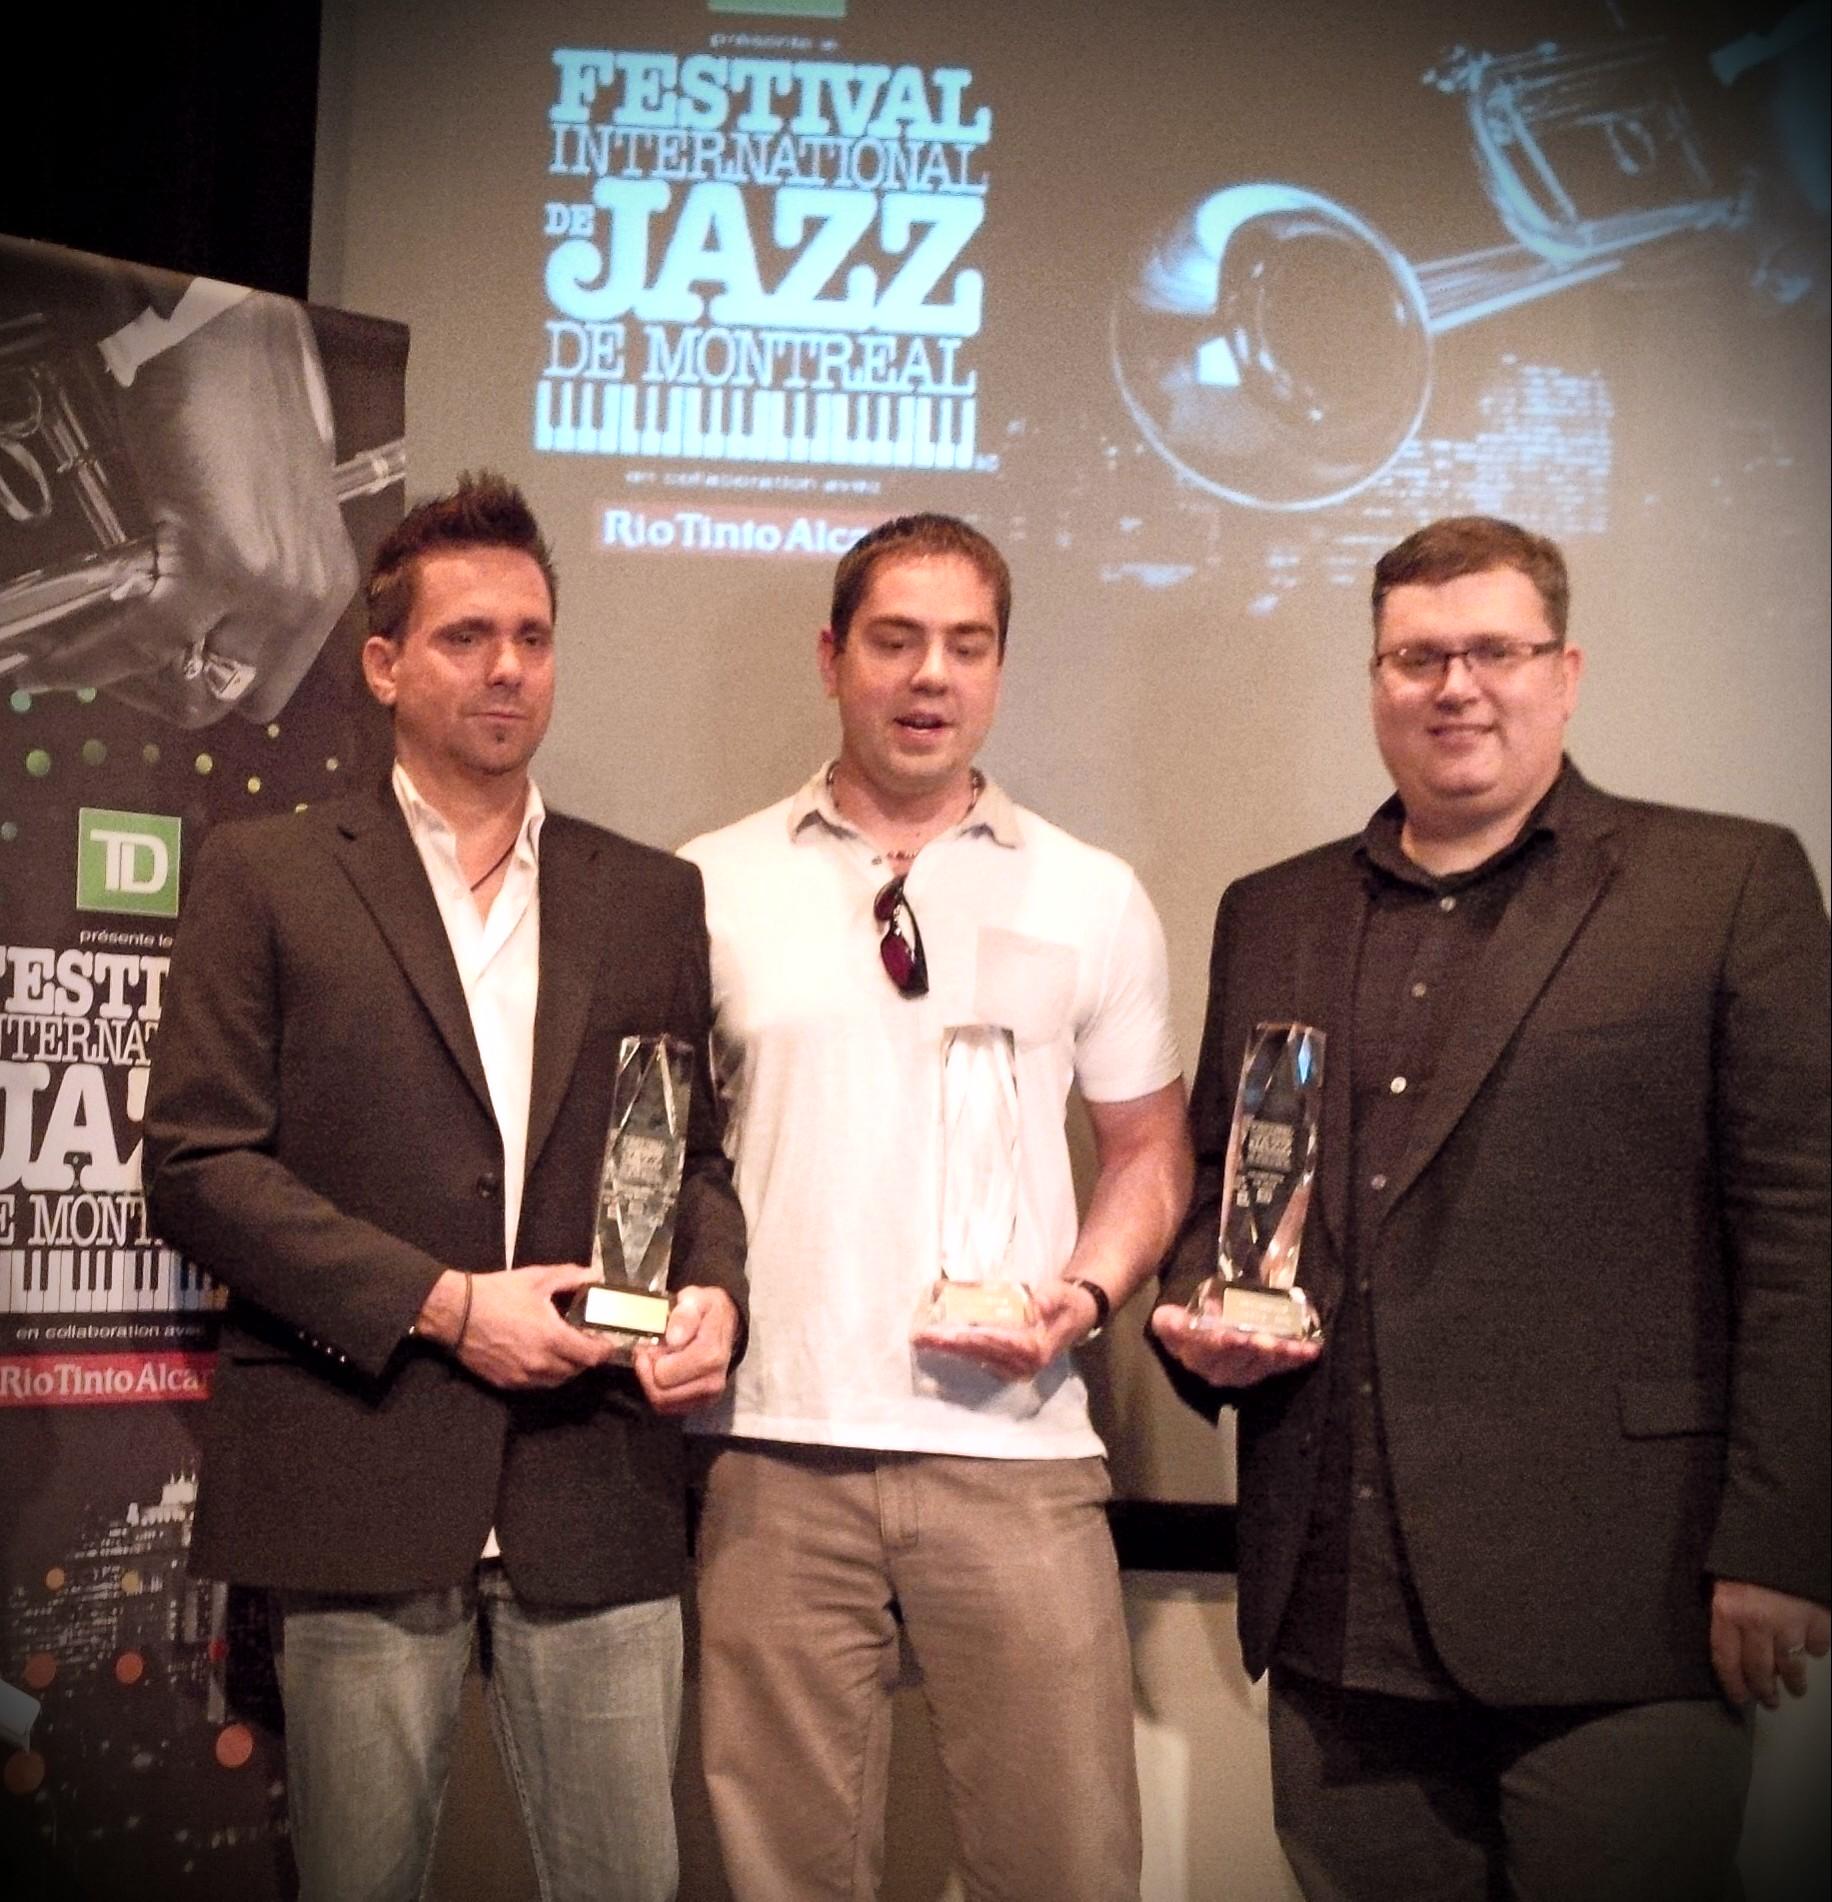 Hutchinson Andrew Trio - 34th Montreal International Jazz Festival Grand Prix Winner